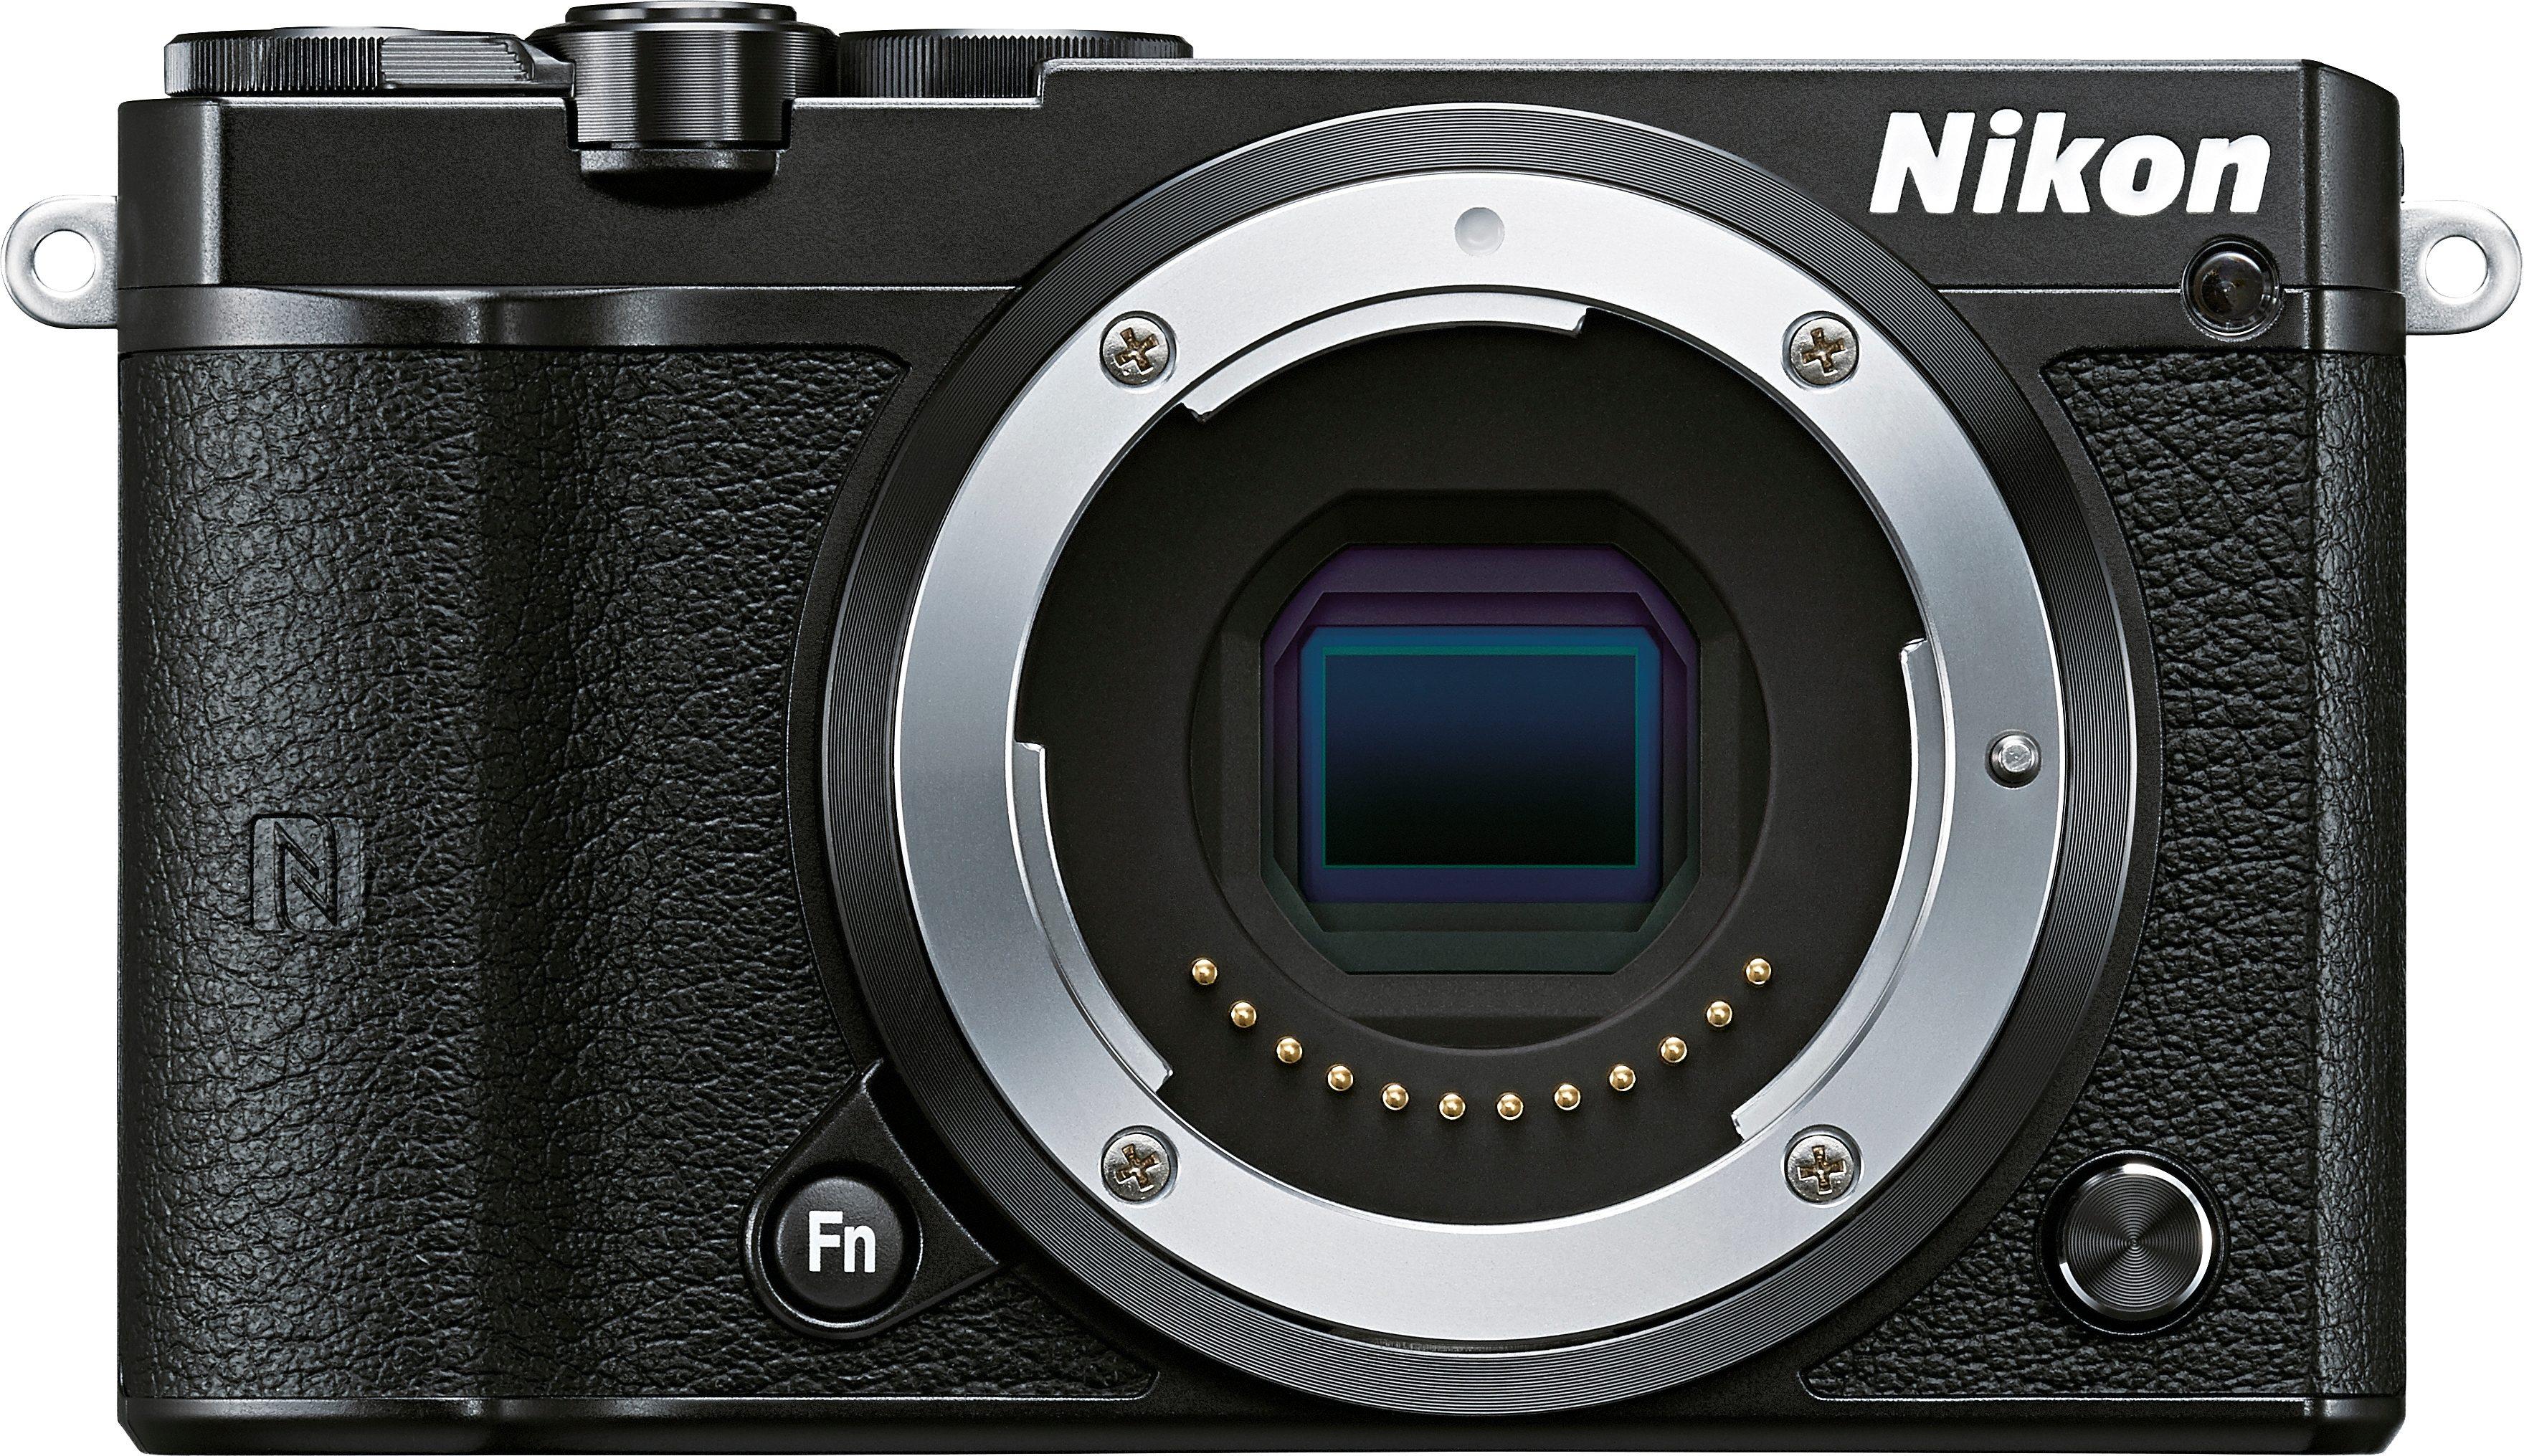 Nikon N1 J5 Body System Kamera, 20,8 Megapixel, 7,5 cm (3 Zoll) Display